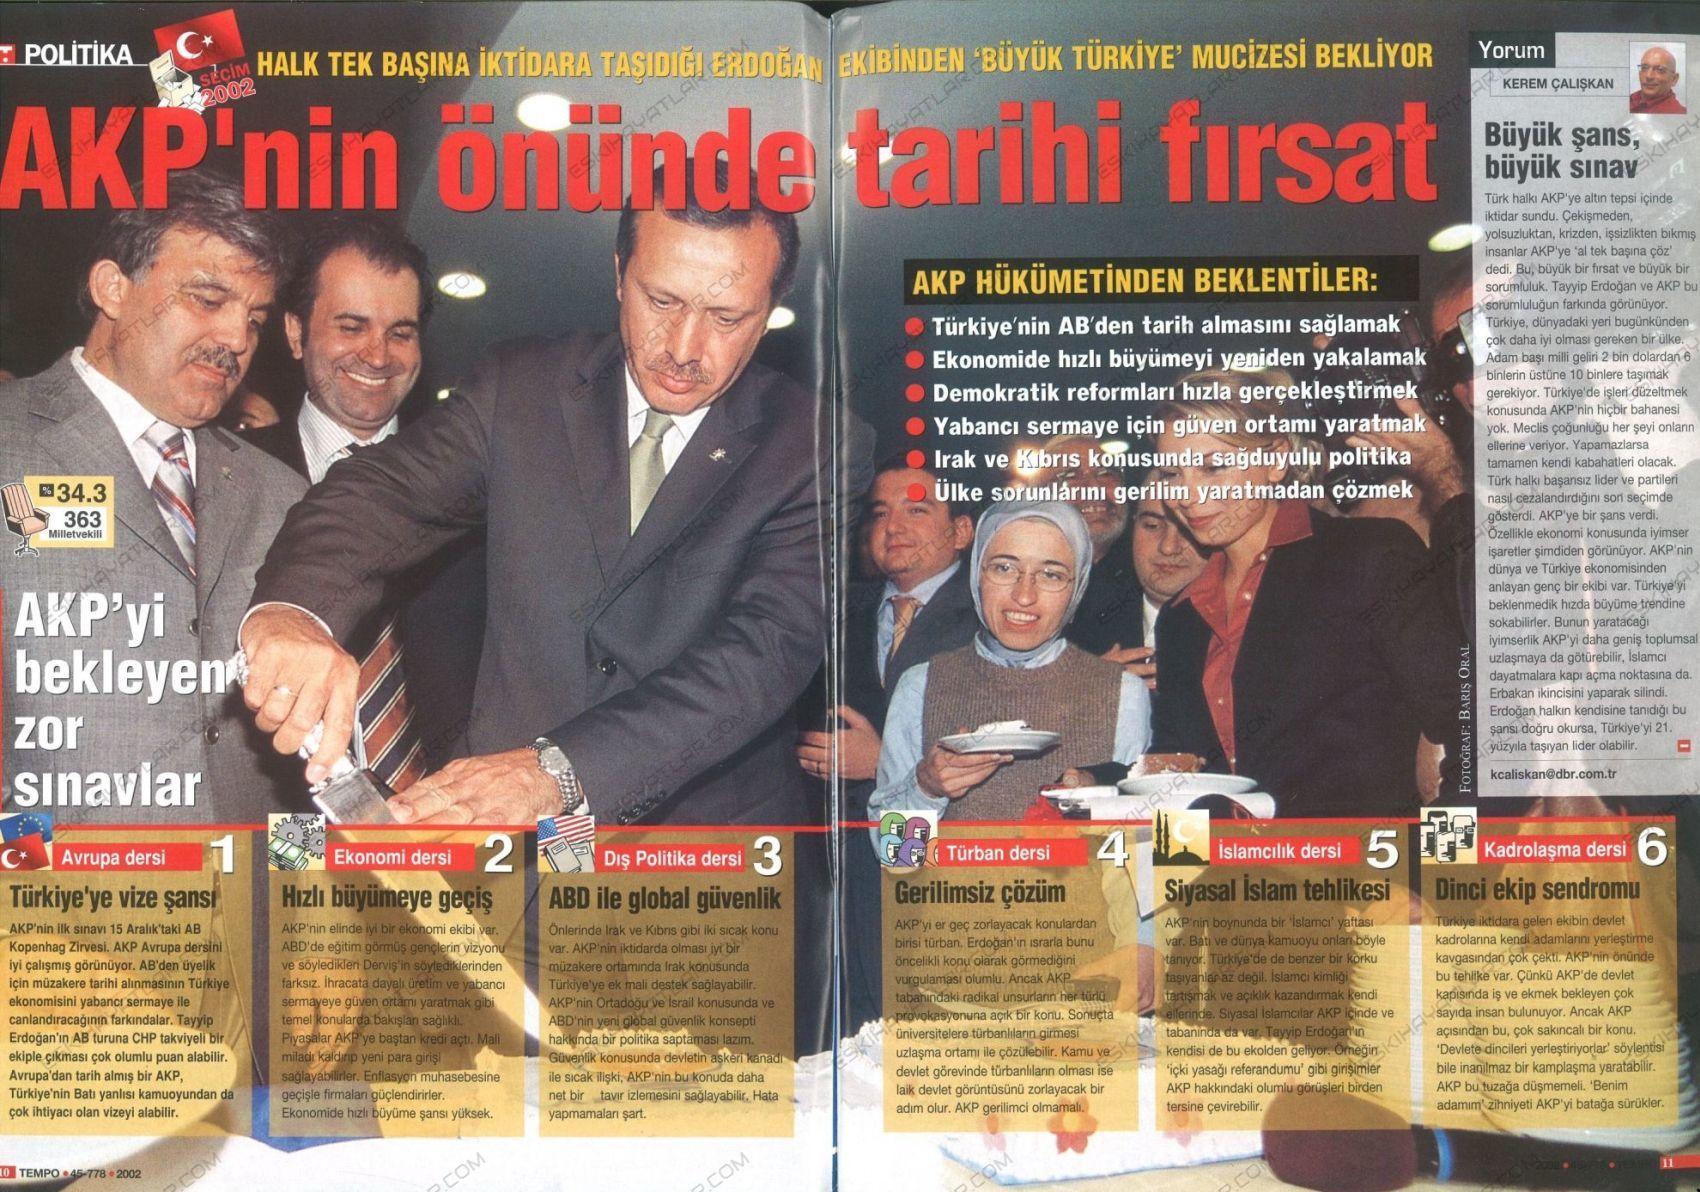 0355-turkiyenin-yeni-umudu-ak-parti-2002-tempo-dergisi-recep-tayyip-erdogan (6)